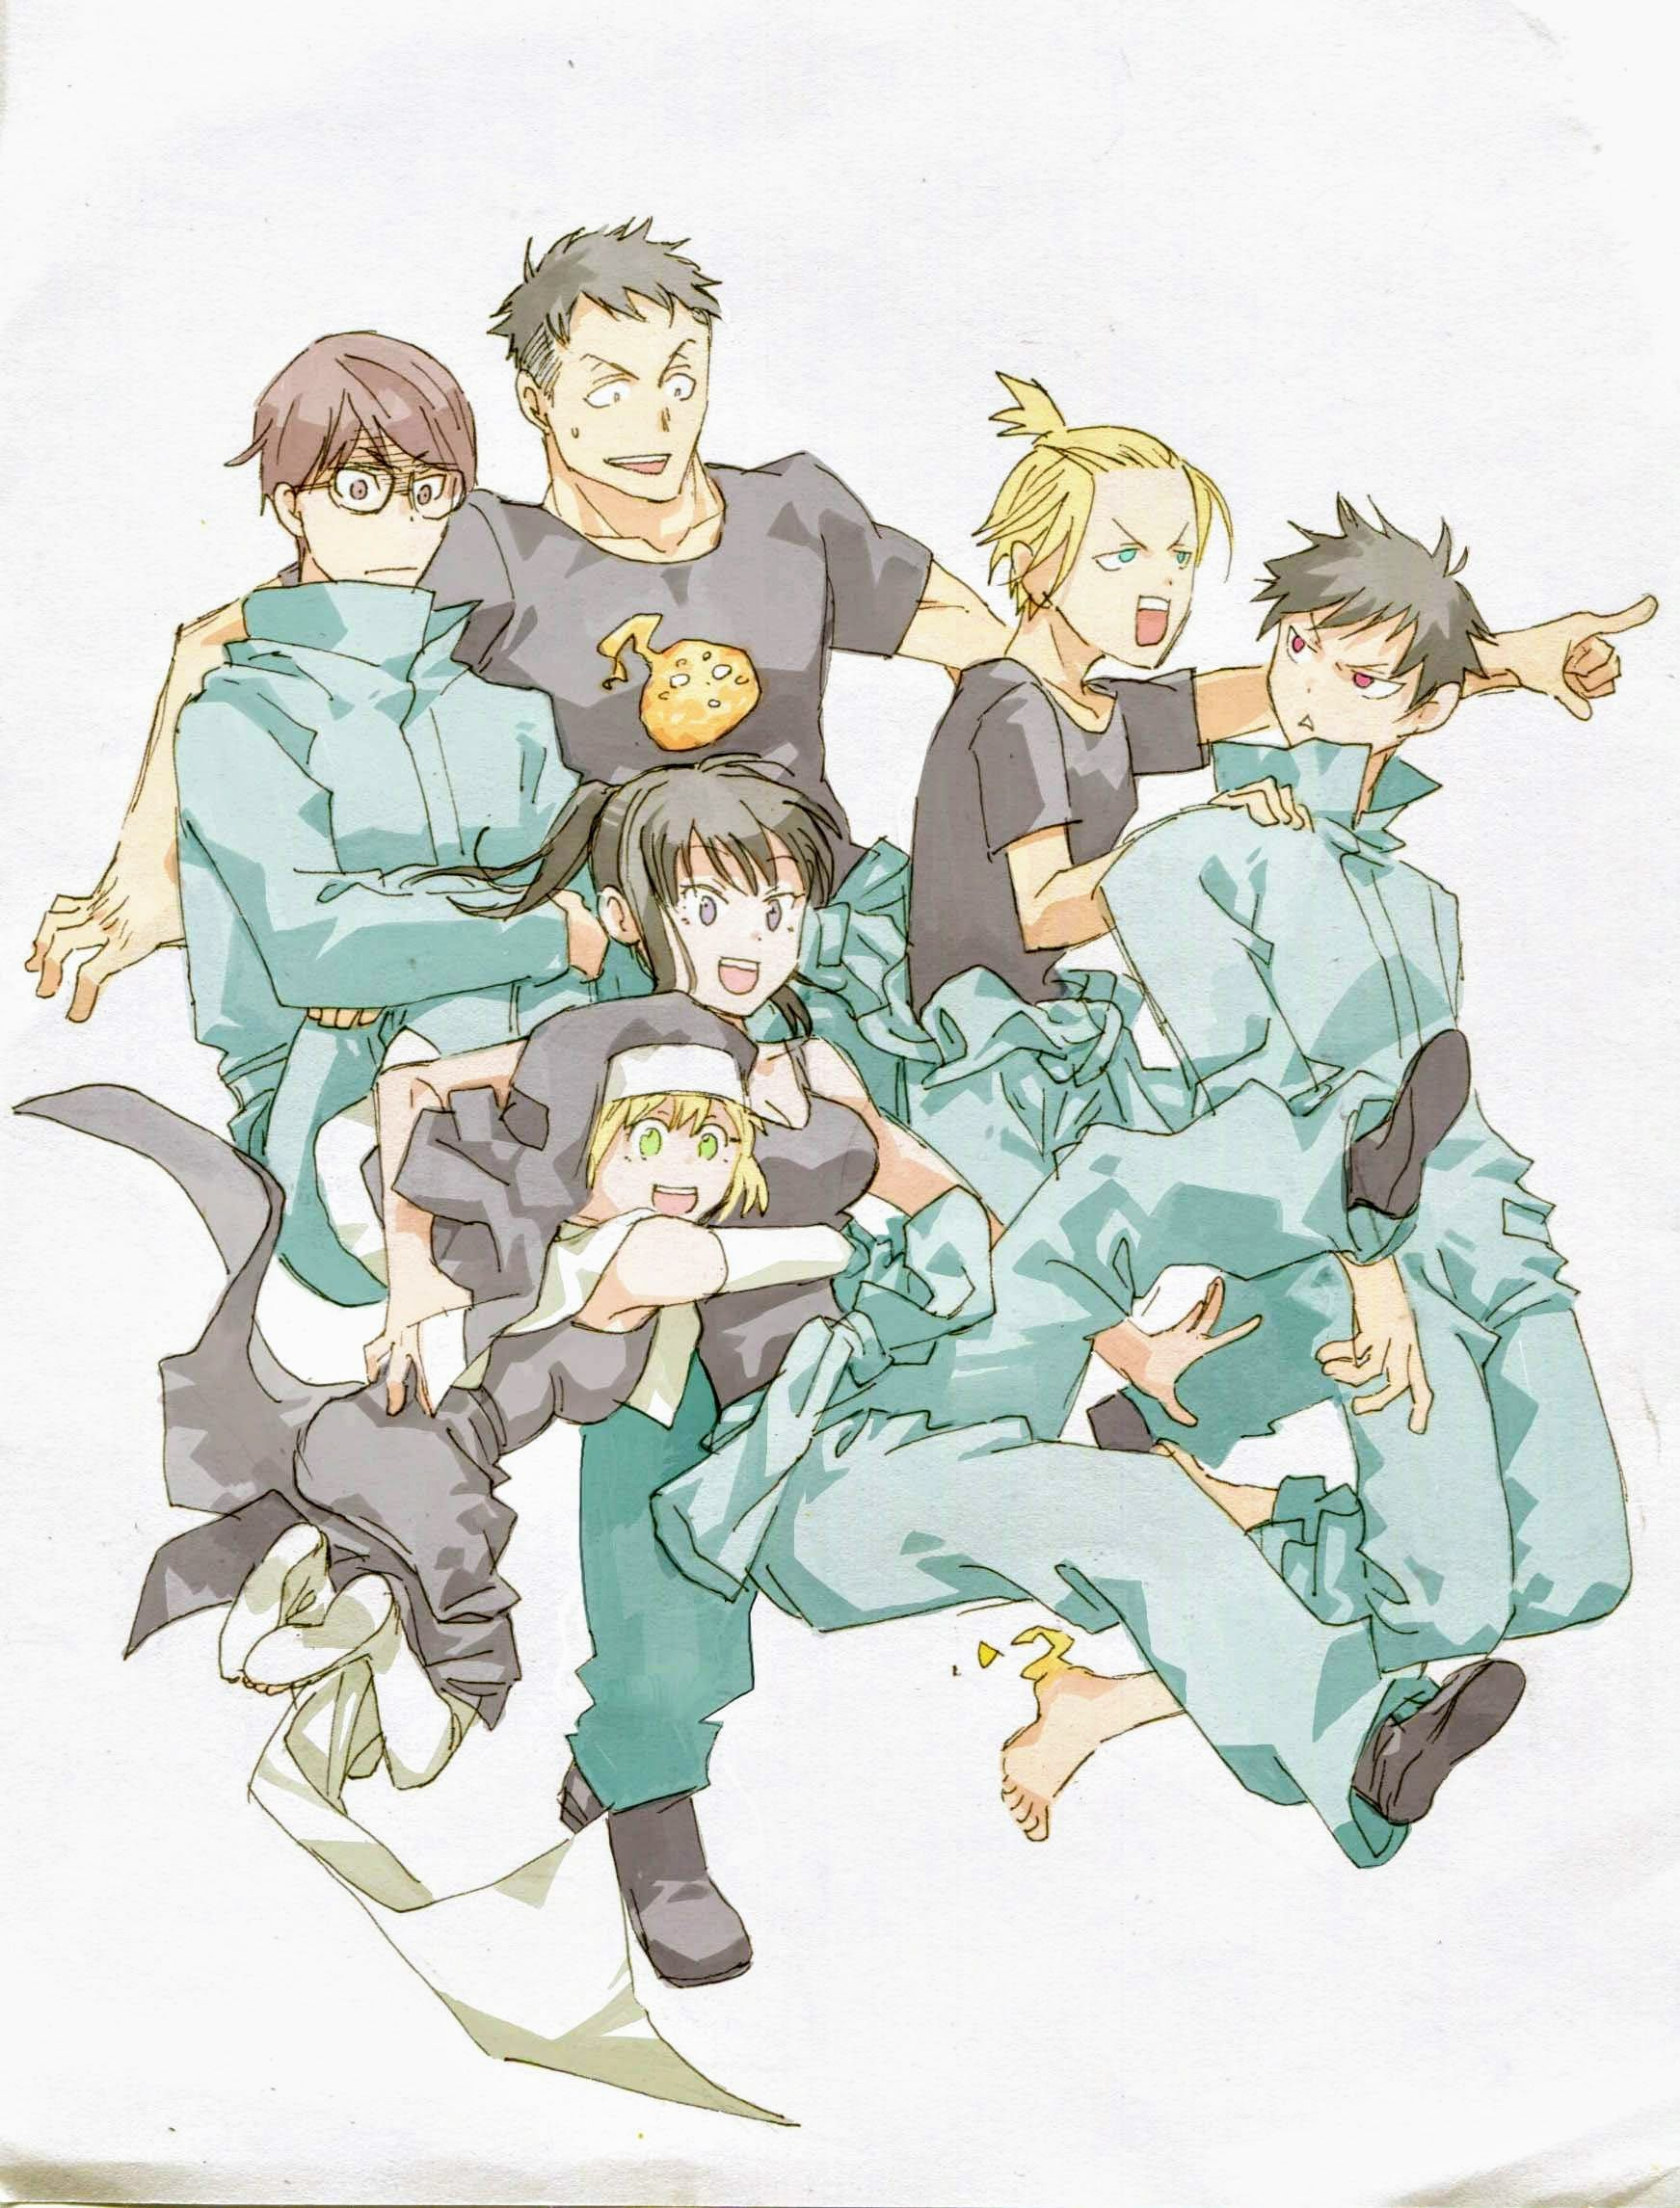 Fire Force FF Fanart Anime Manga ╳Subscribe╳Share╳GG